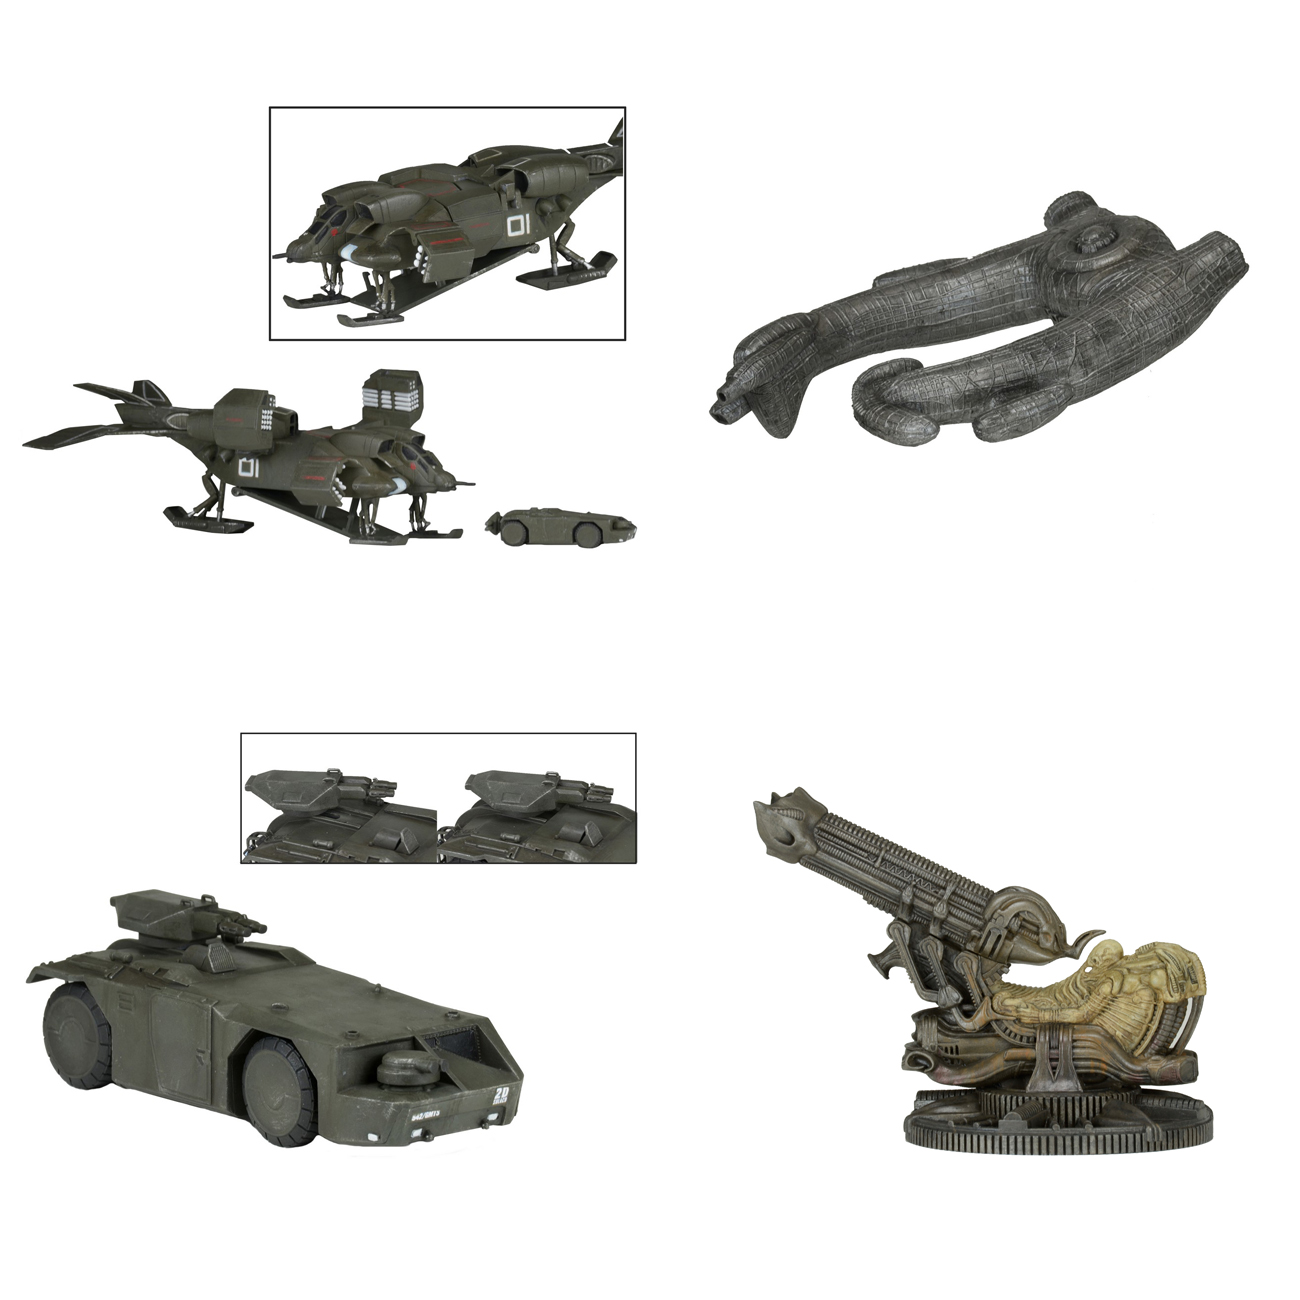 NECA Toys Cinemachines Die-Cast Collectibles Series 1 On Amazon & eBay Store